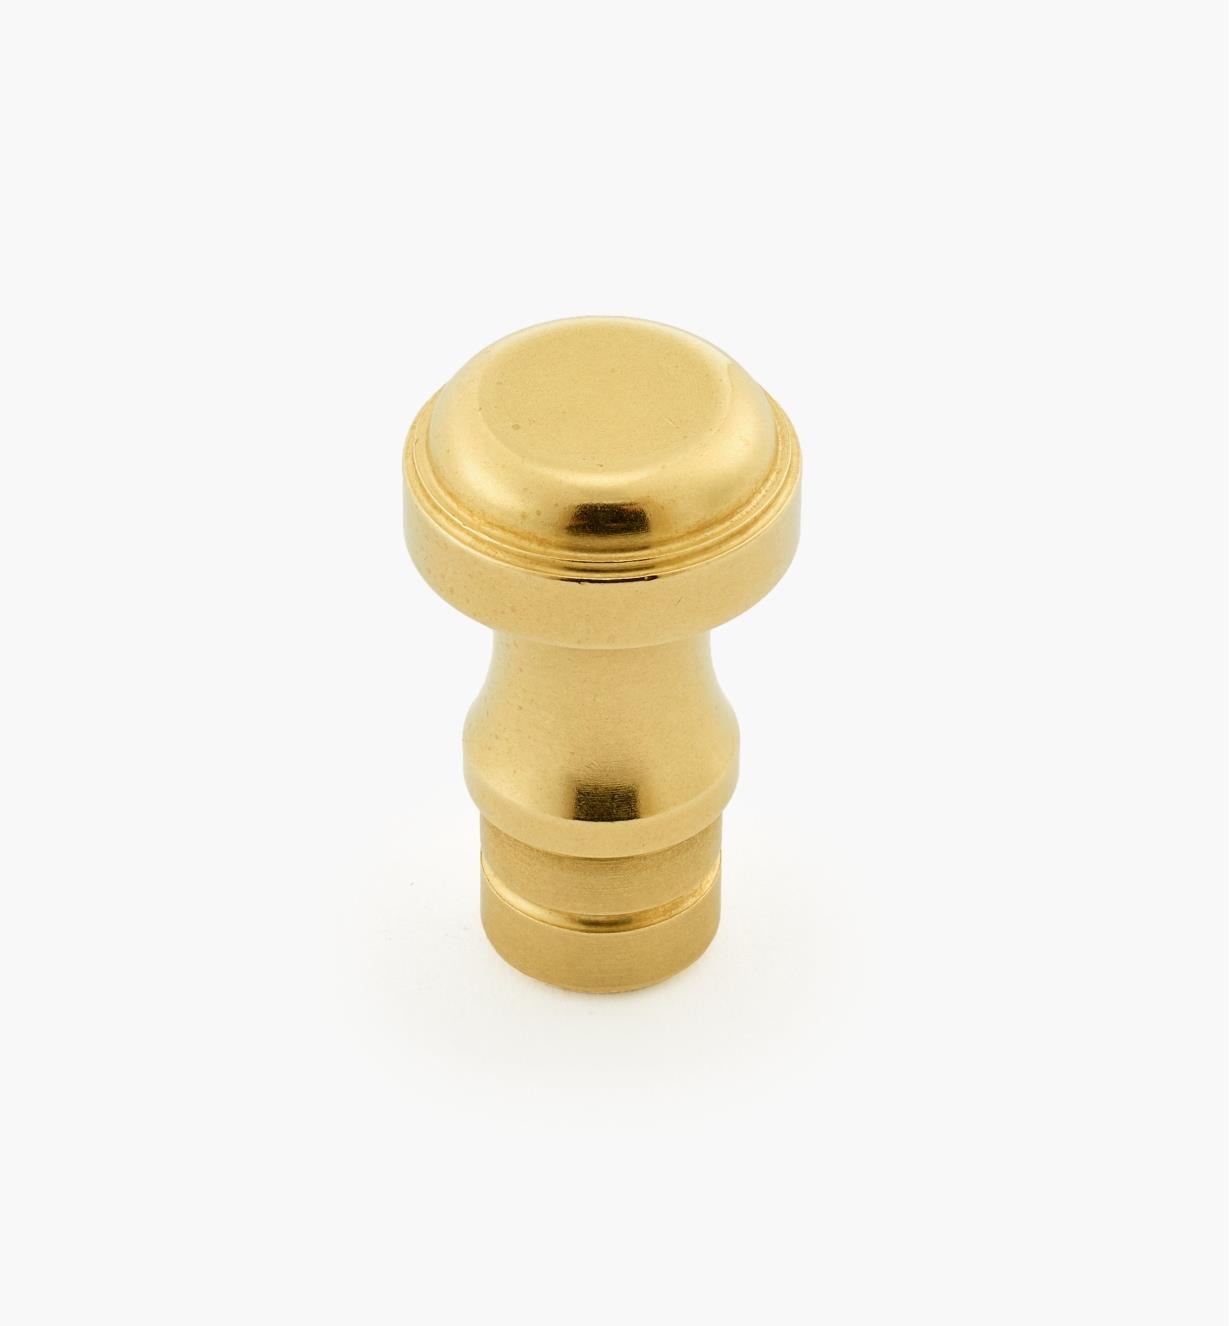 "01B1132 - 1/2"" x  5/16"" Brass Knob"